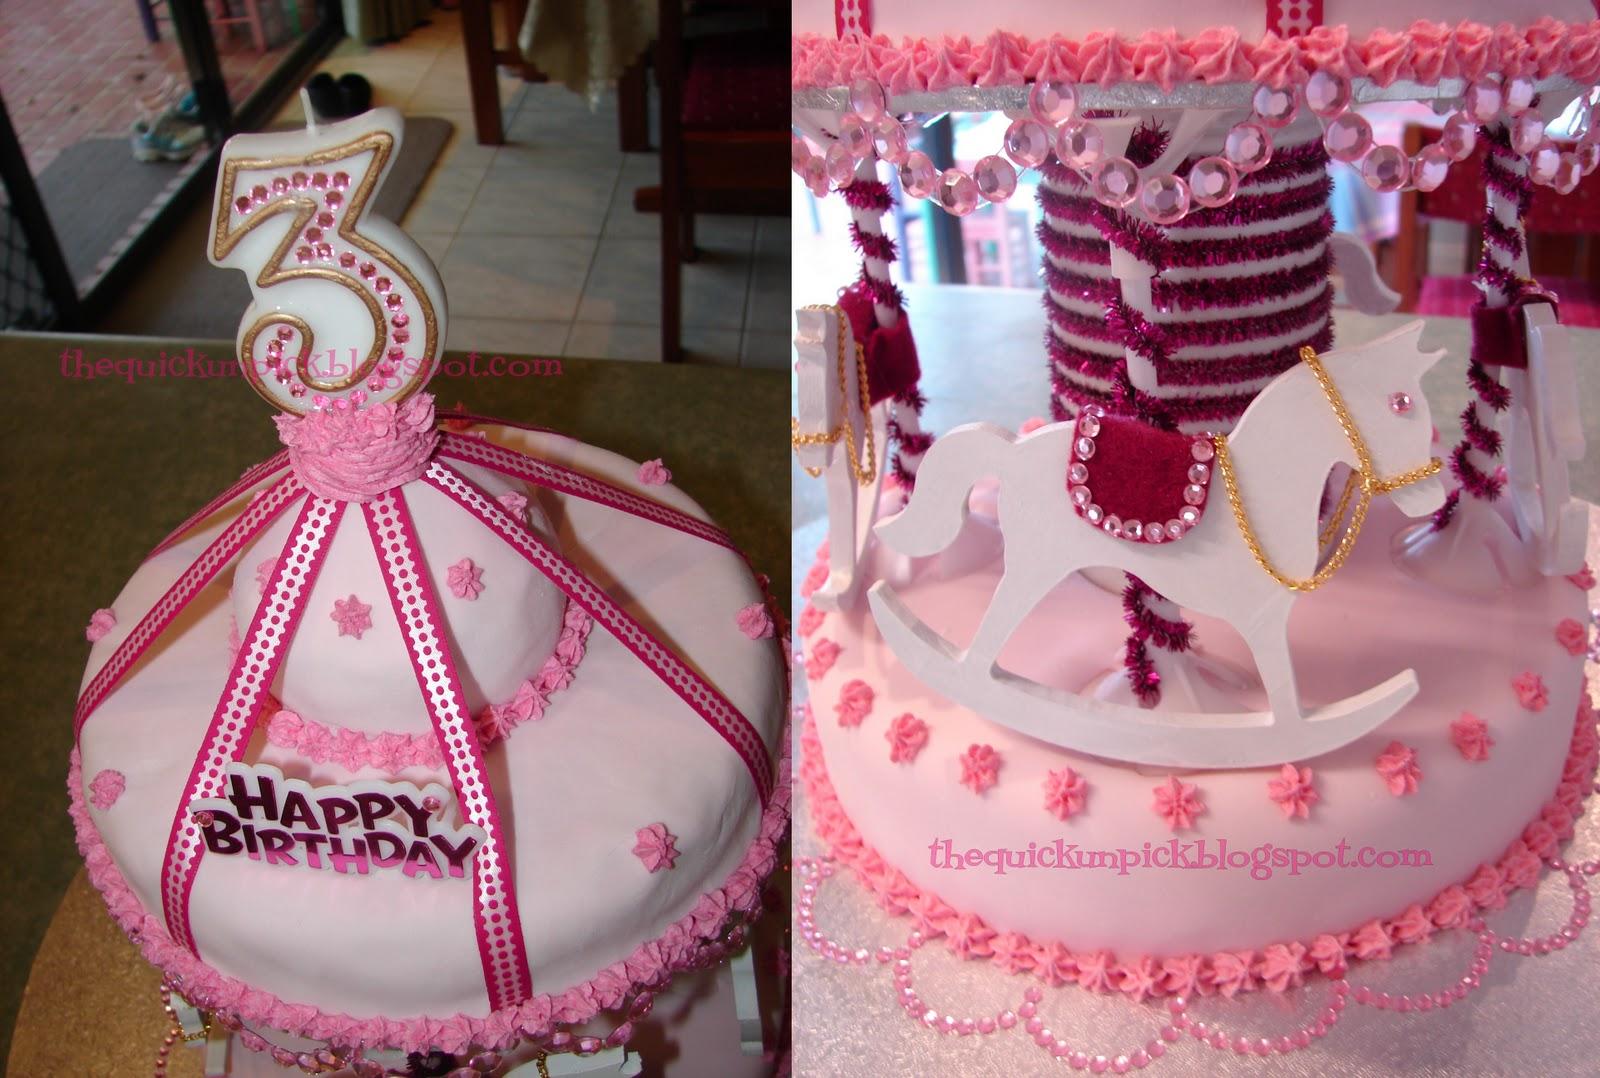 The Quick Unpick Beautiful Birthday Cakes Princesses a castle